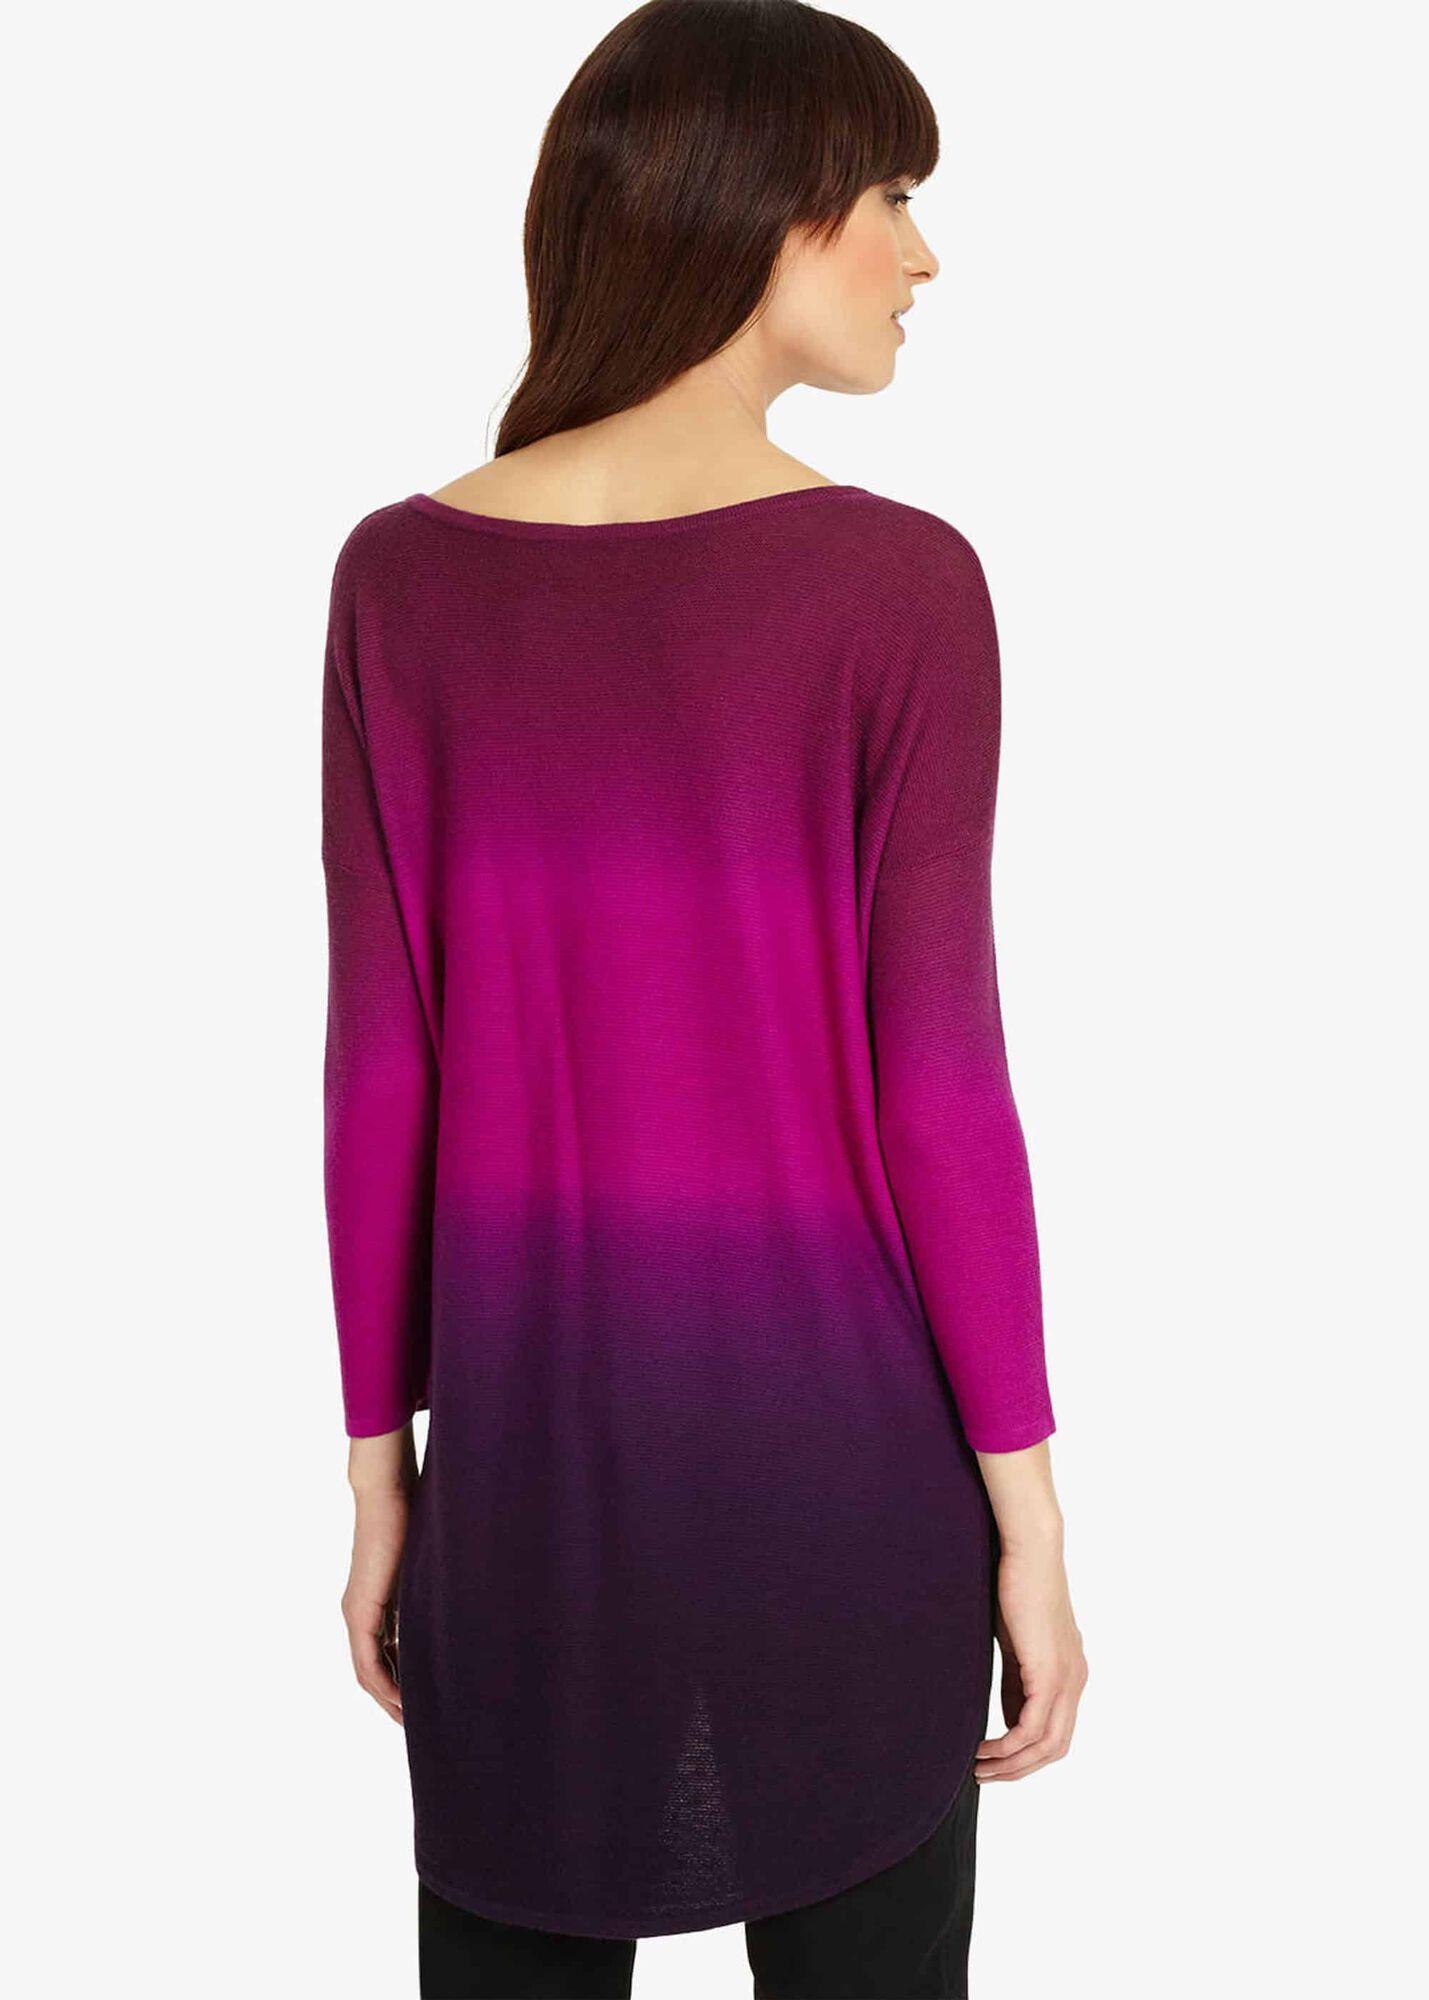 c6a8676124f Lynda Dip Dye Knit Top | Phase Eight | Phase Eight